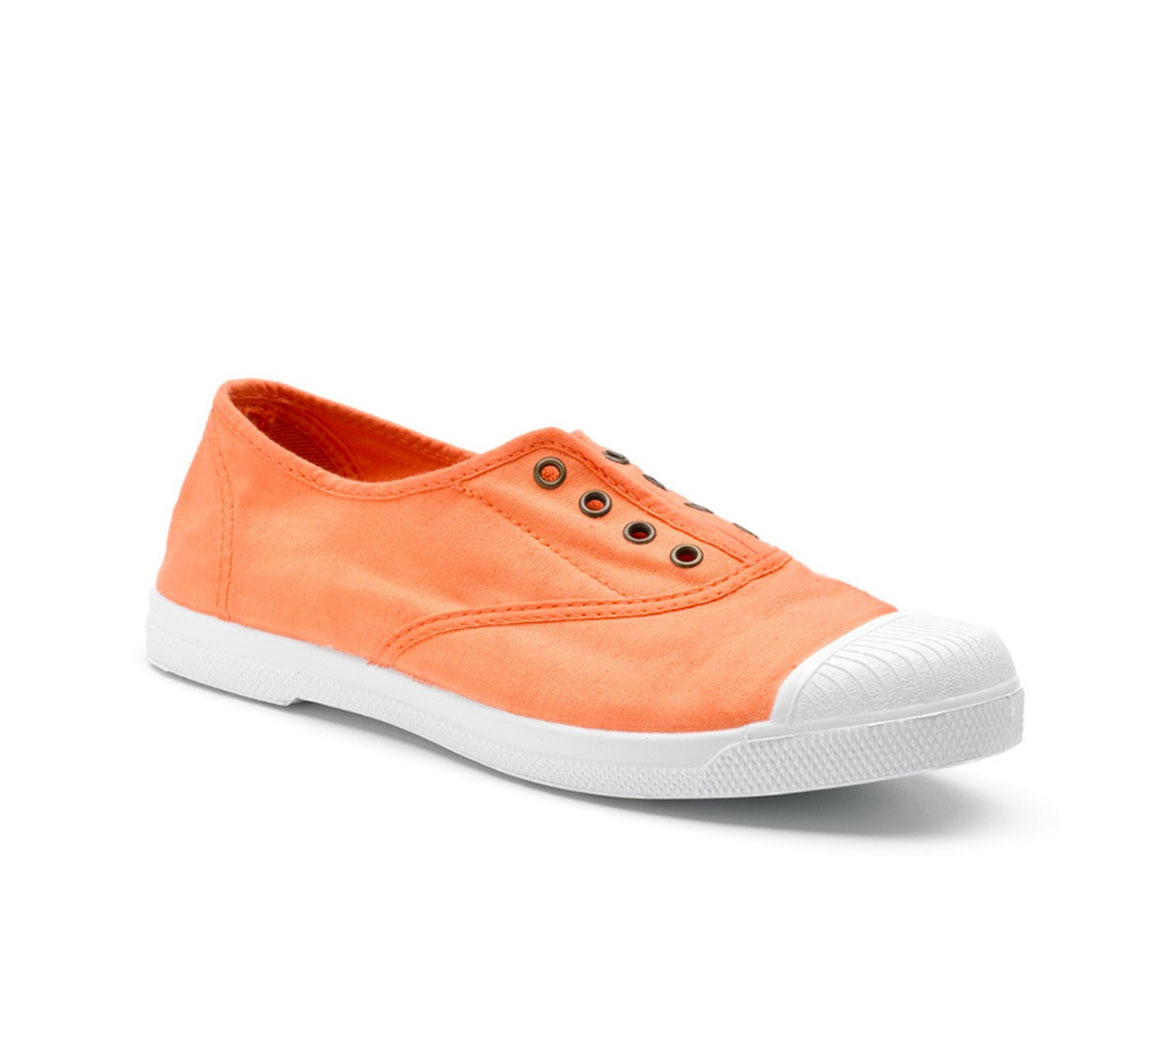 Chaussure femme Ingles Elastico Enzimatico